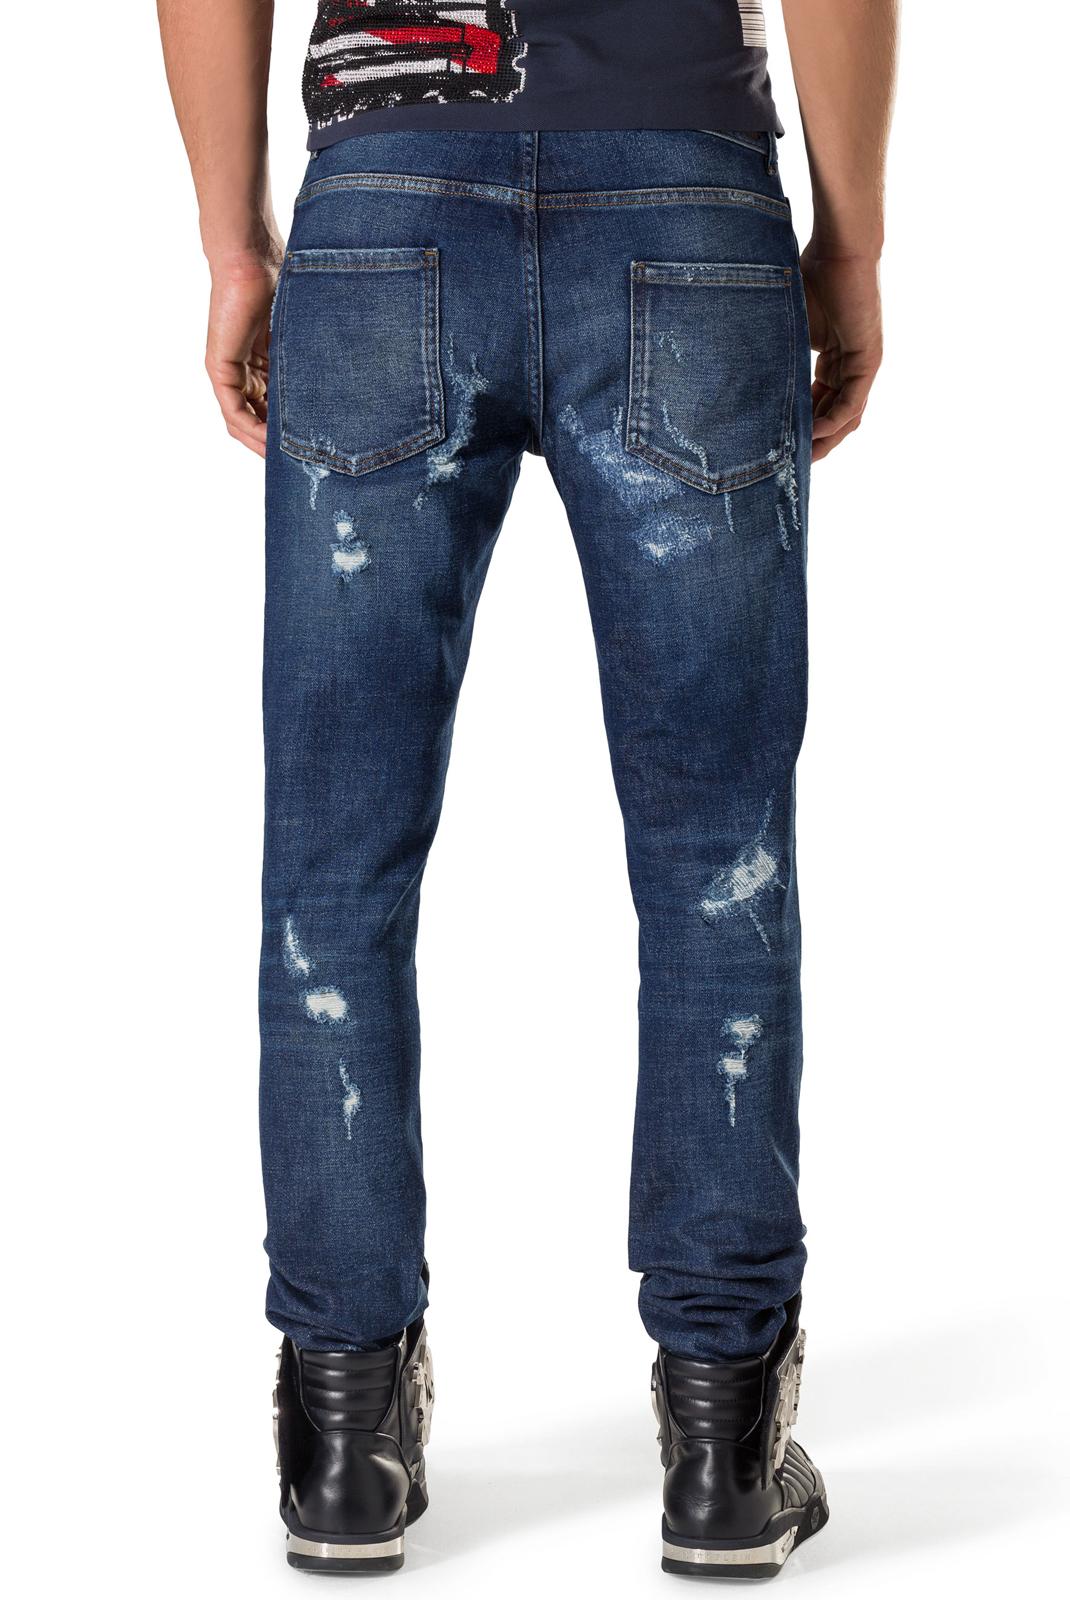 Jeans  Philipp plein A17C MDT0517 CANGE 14MT MID TOWN